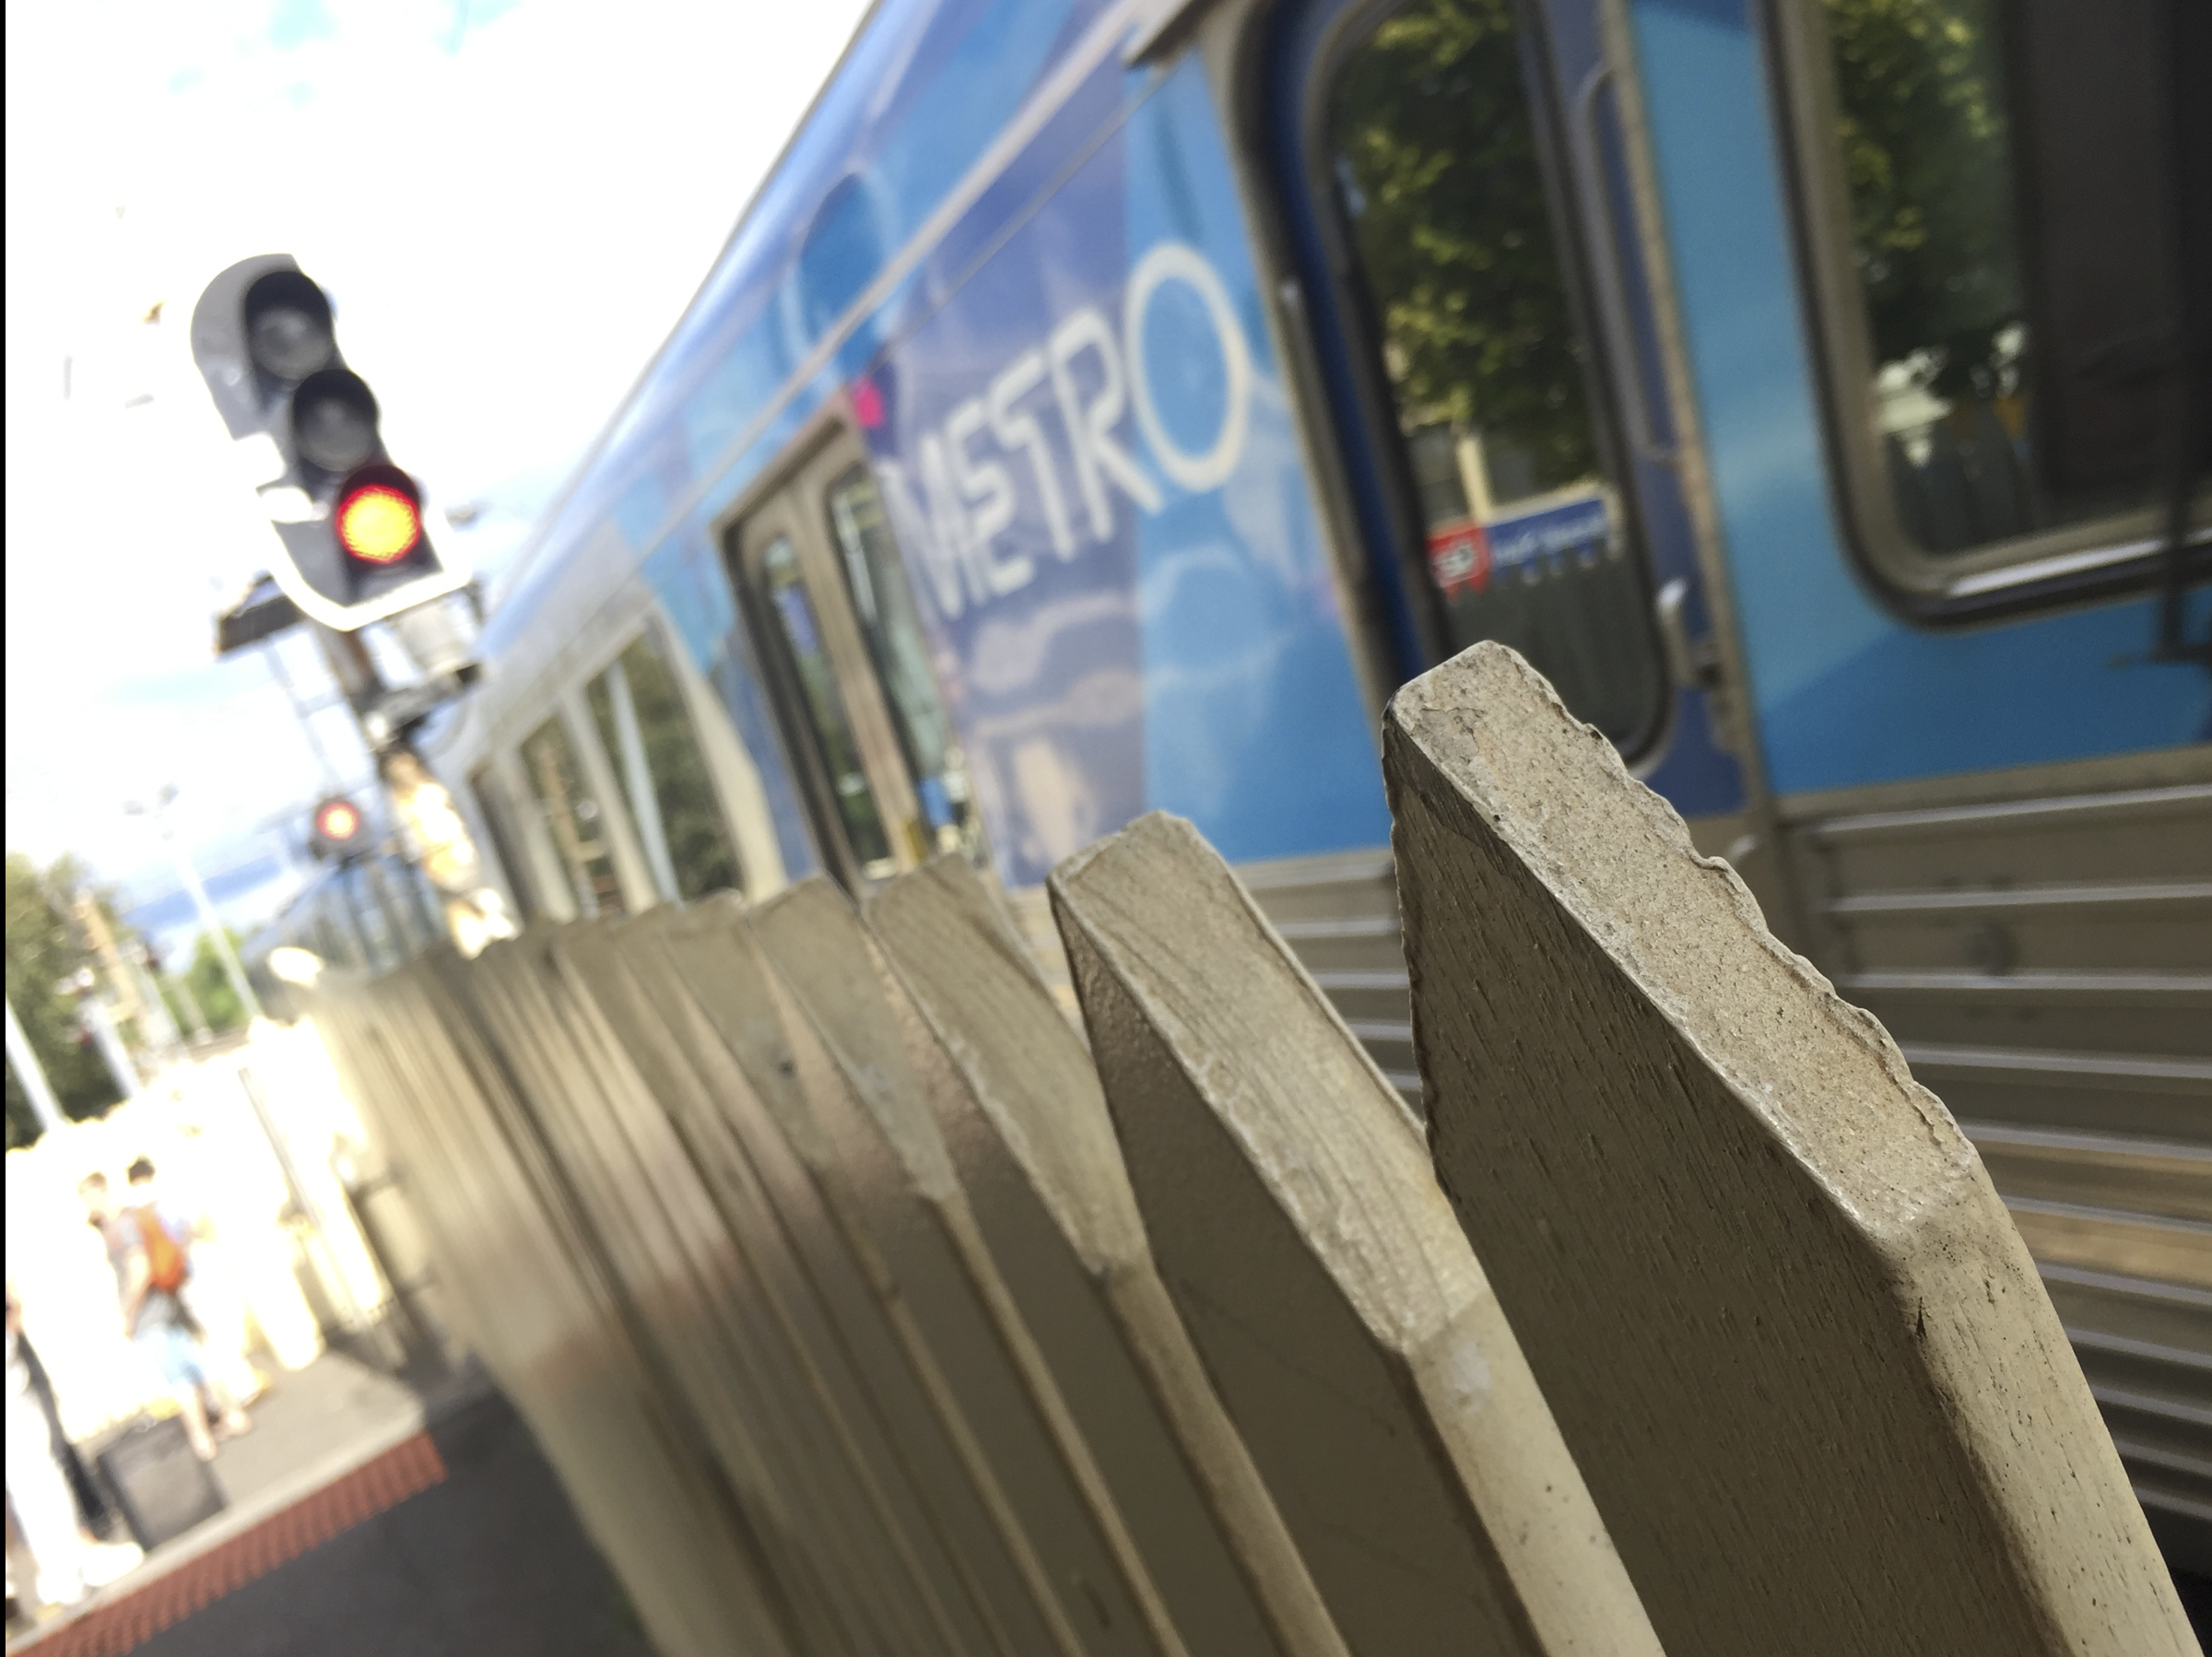 Melbourne Metro Project - Melbourne Metro is the operator of the suburban railway network in Melbourne, Australia.